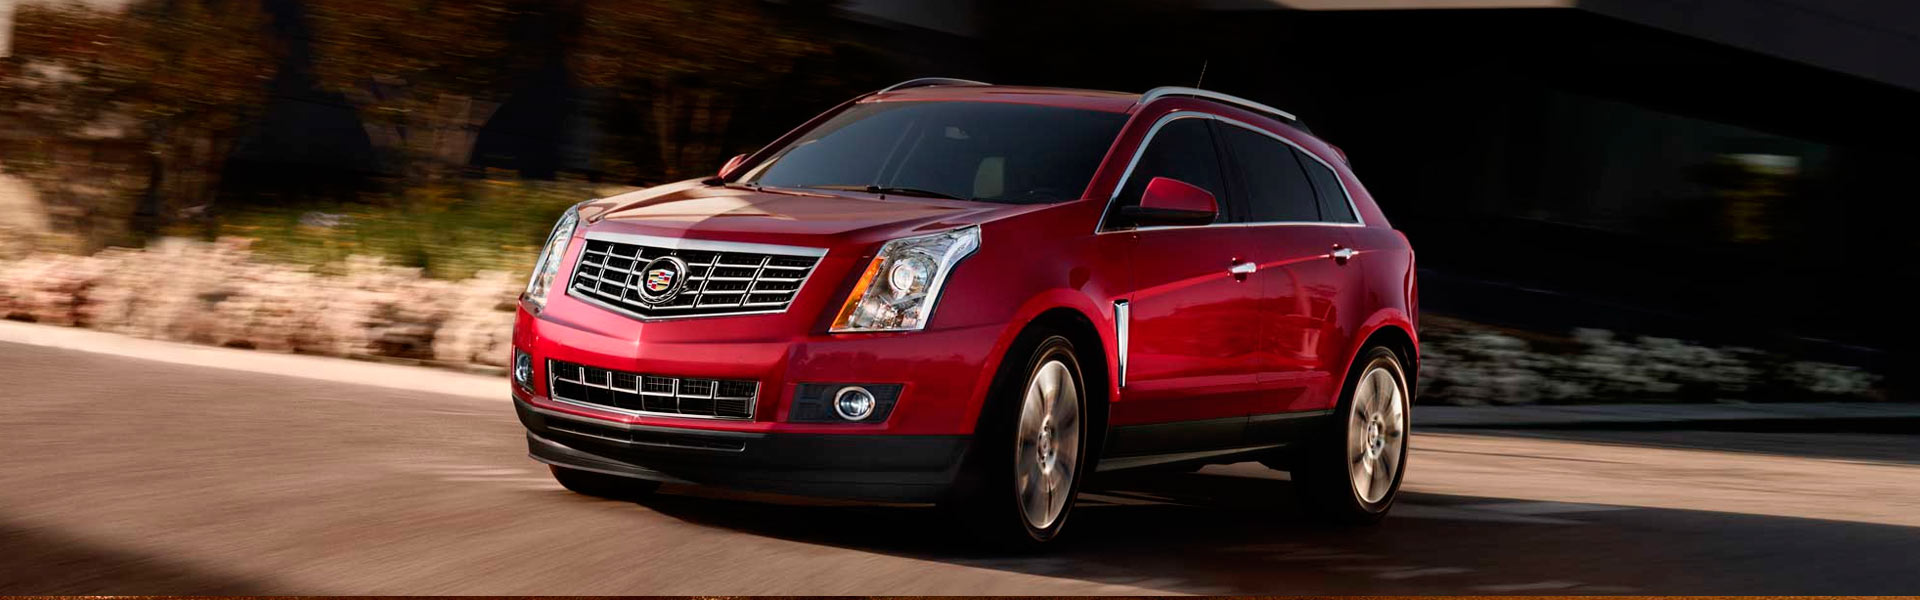 Замена охлаждающей жидкости Cadillac